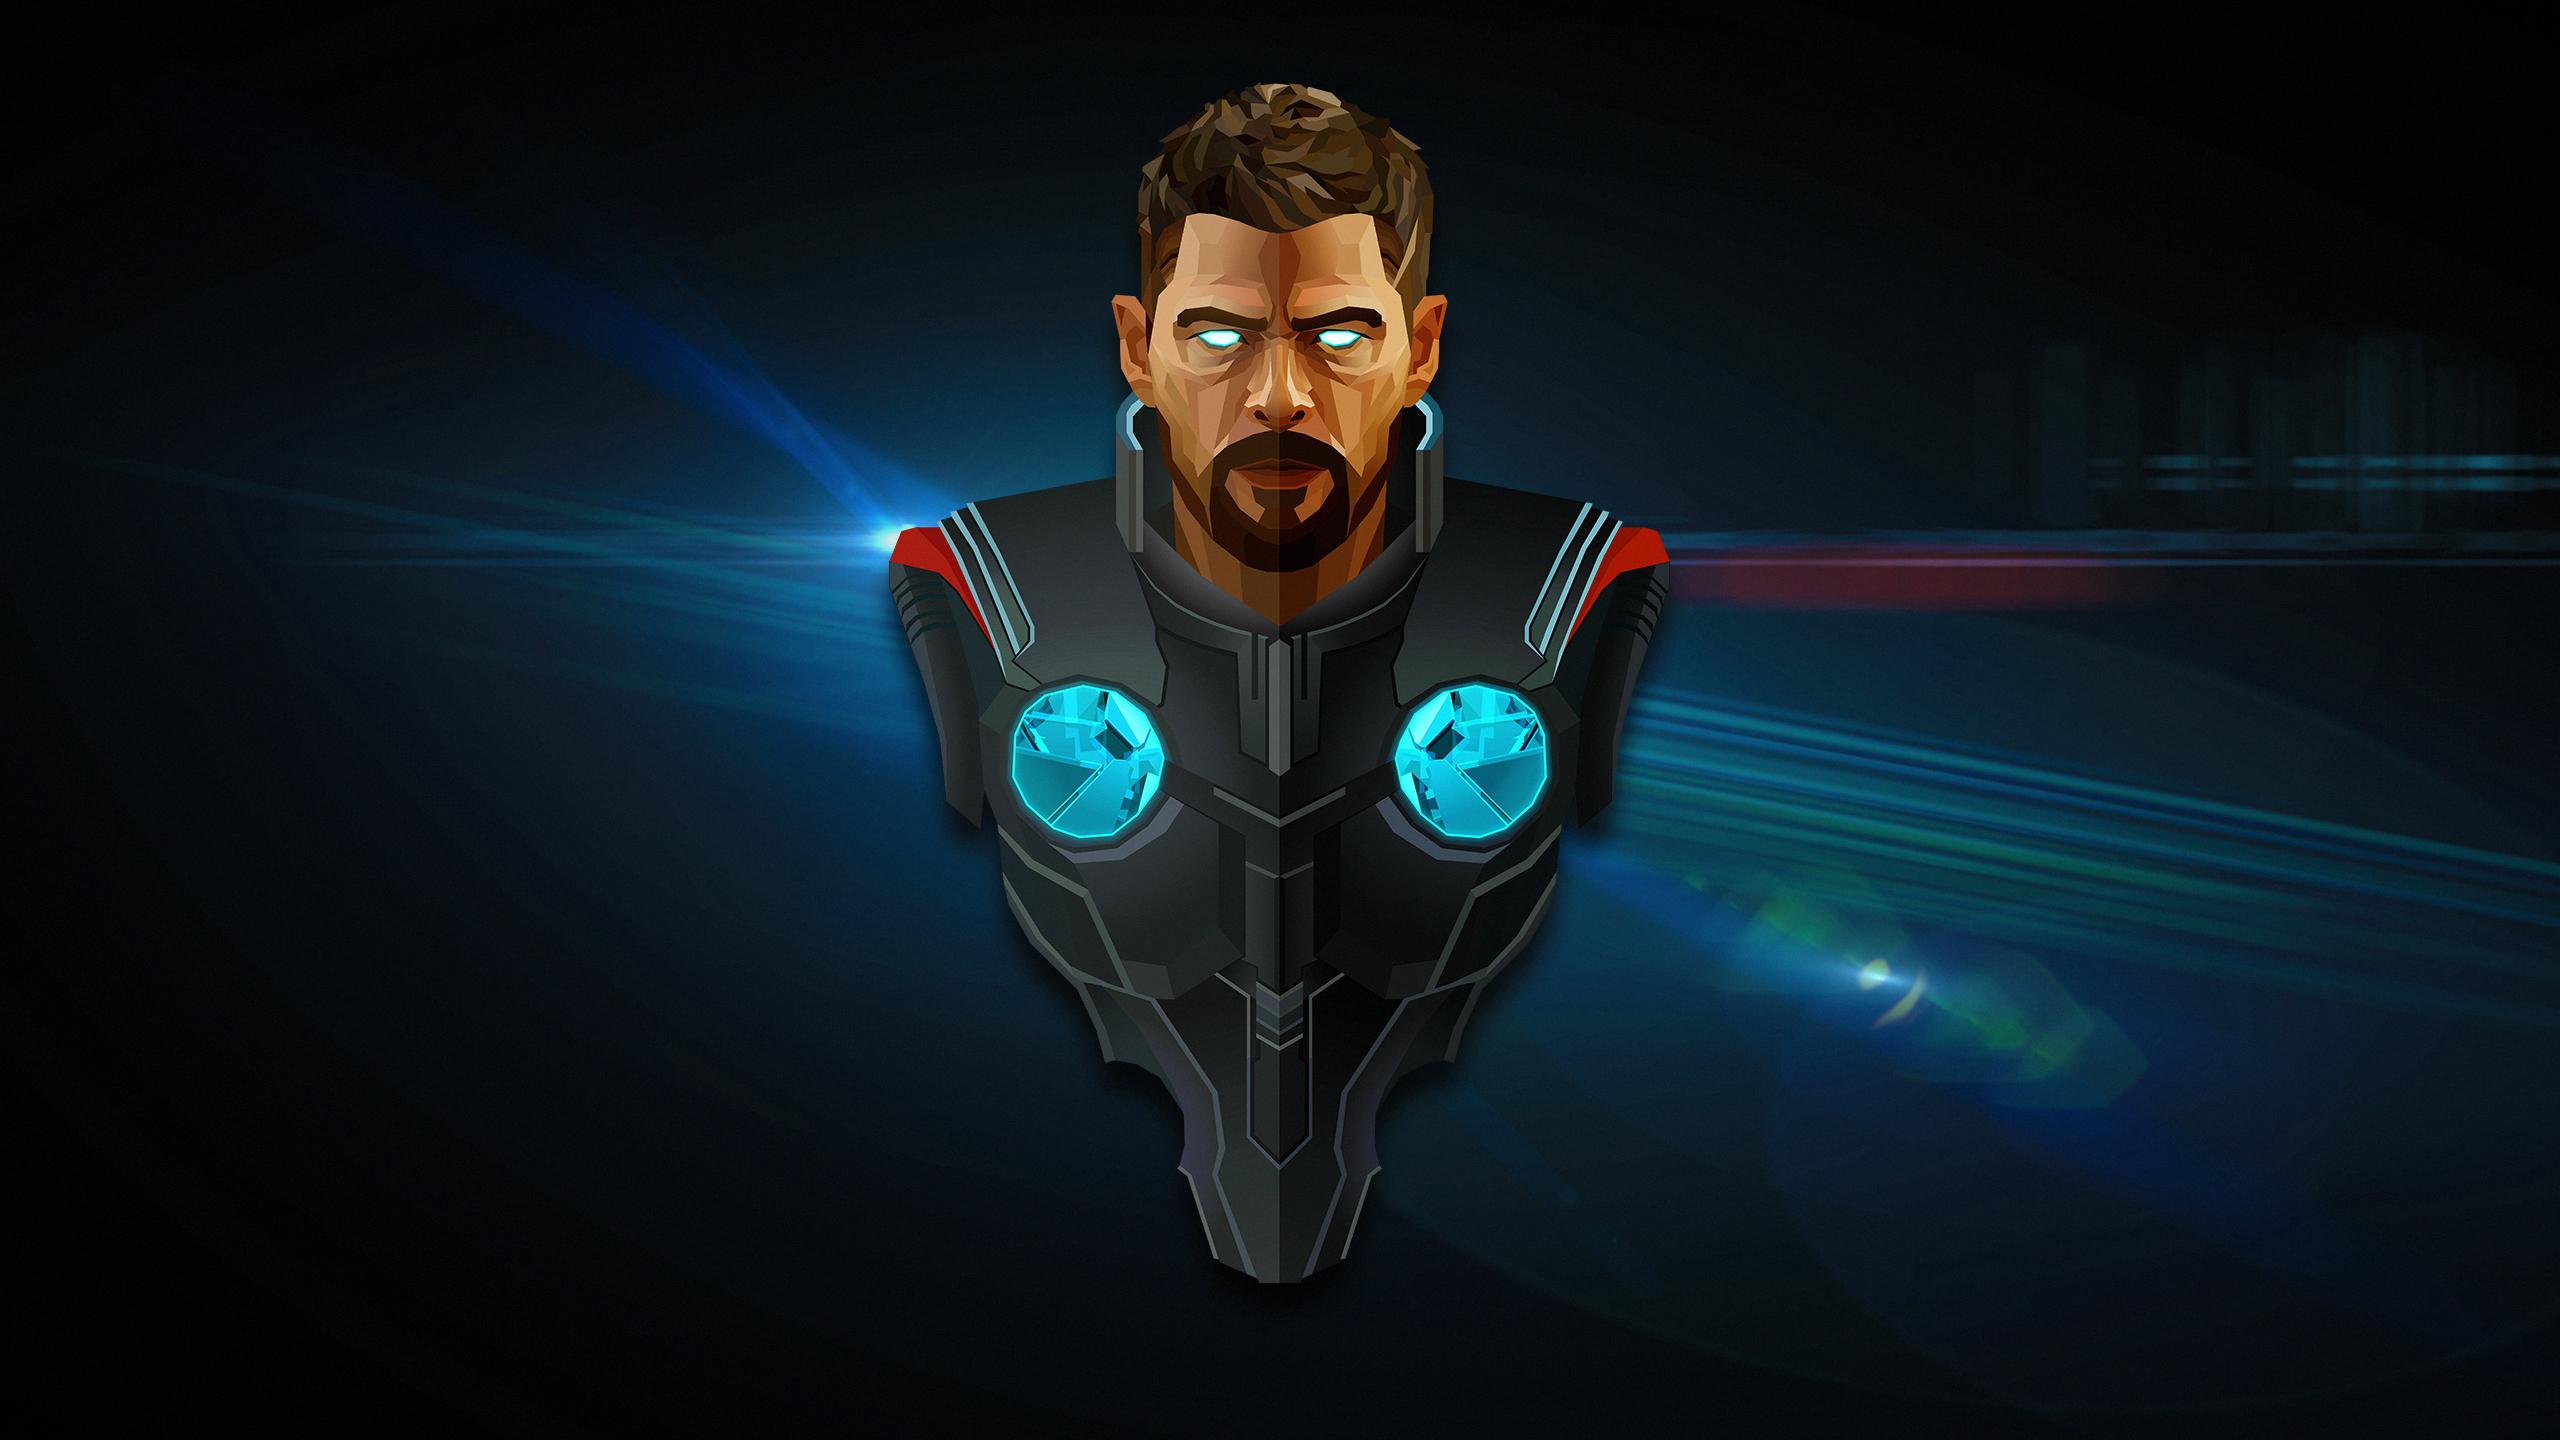 3d Thor Ragnarok Android Wallpaper Thor Avengers Infinity War Minimal Artwork Wallpapers Hd